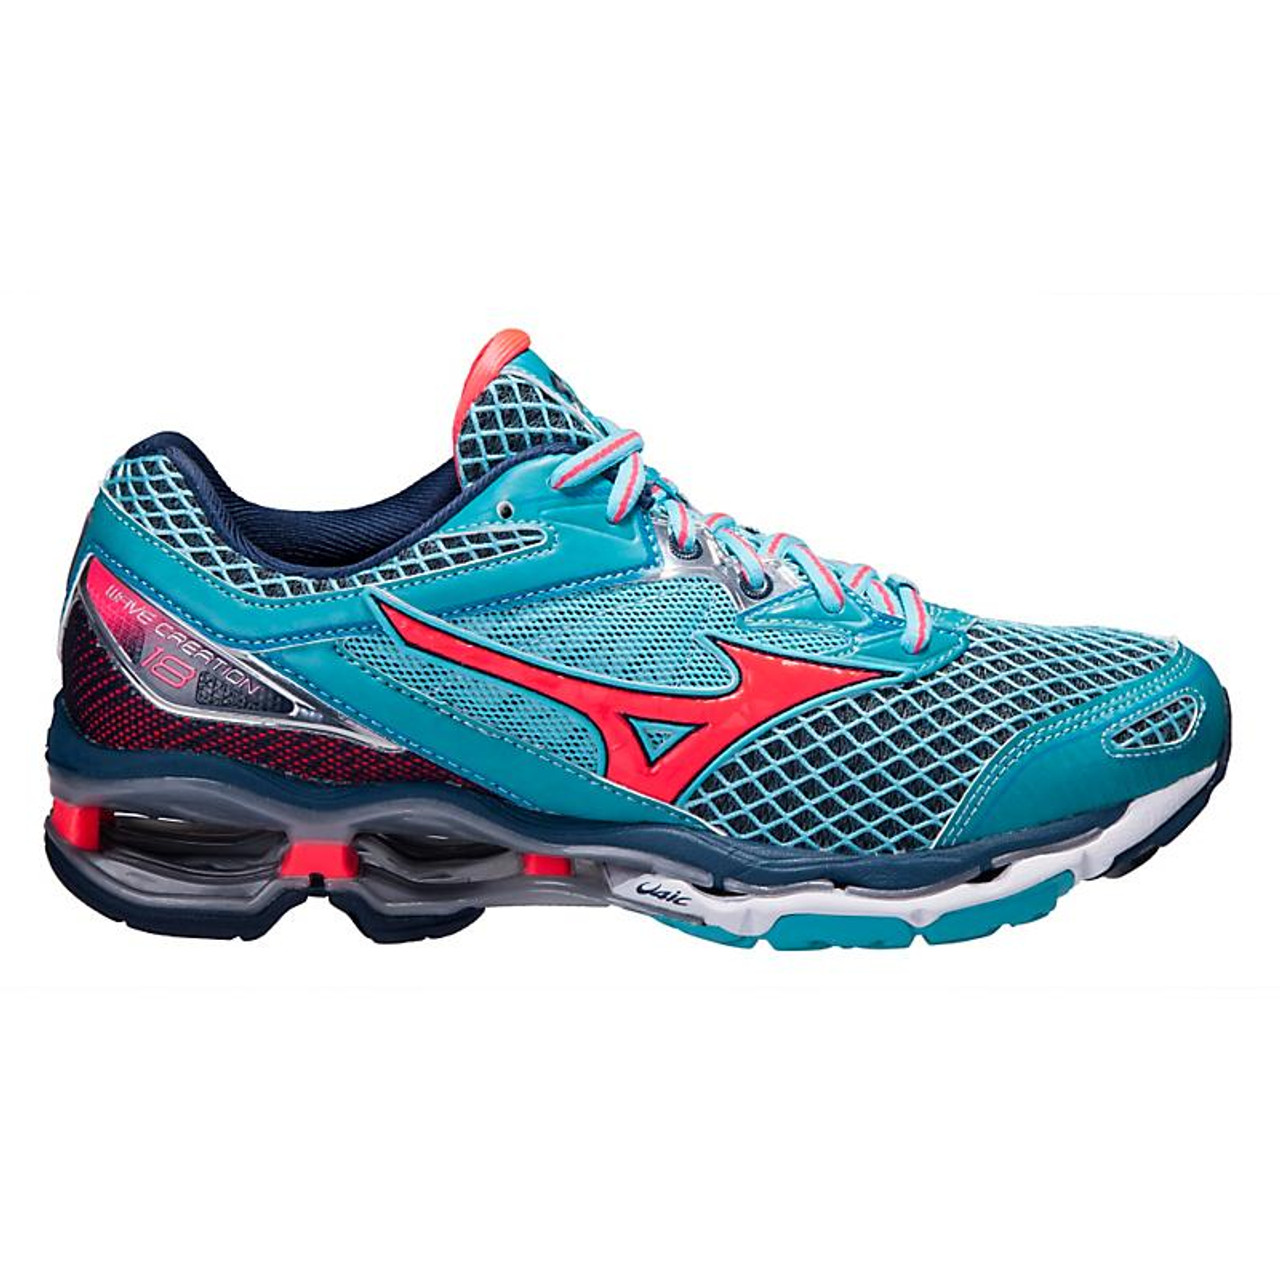 sale retailer a14b3 89c98 Home · Footwear · Women s Mizuno Wave Creation 18. Sale